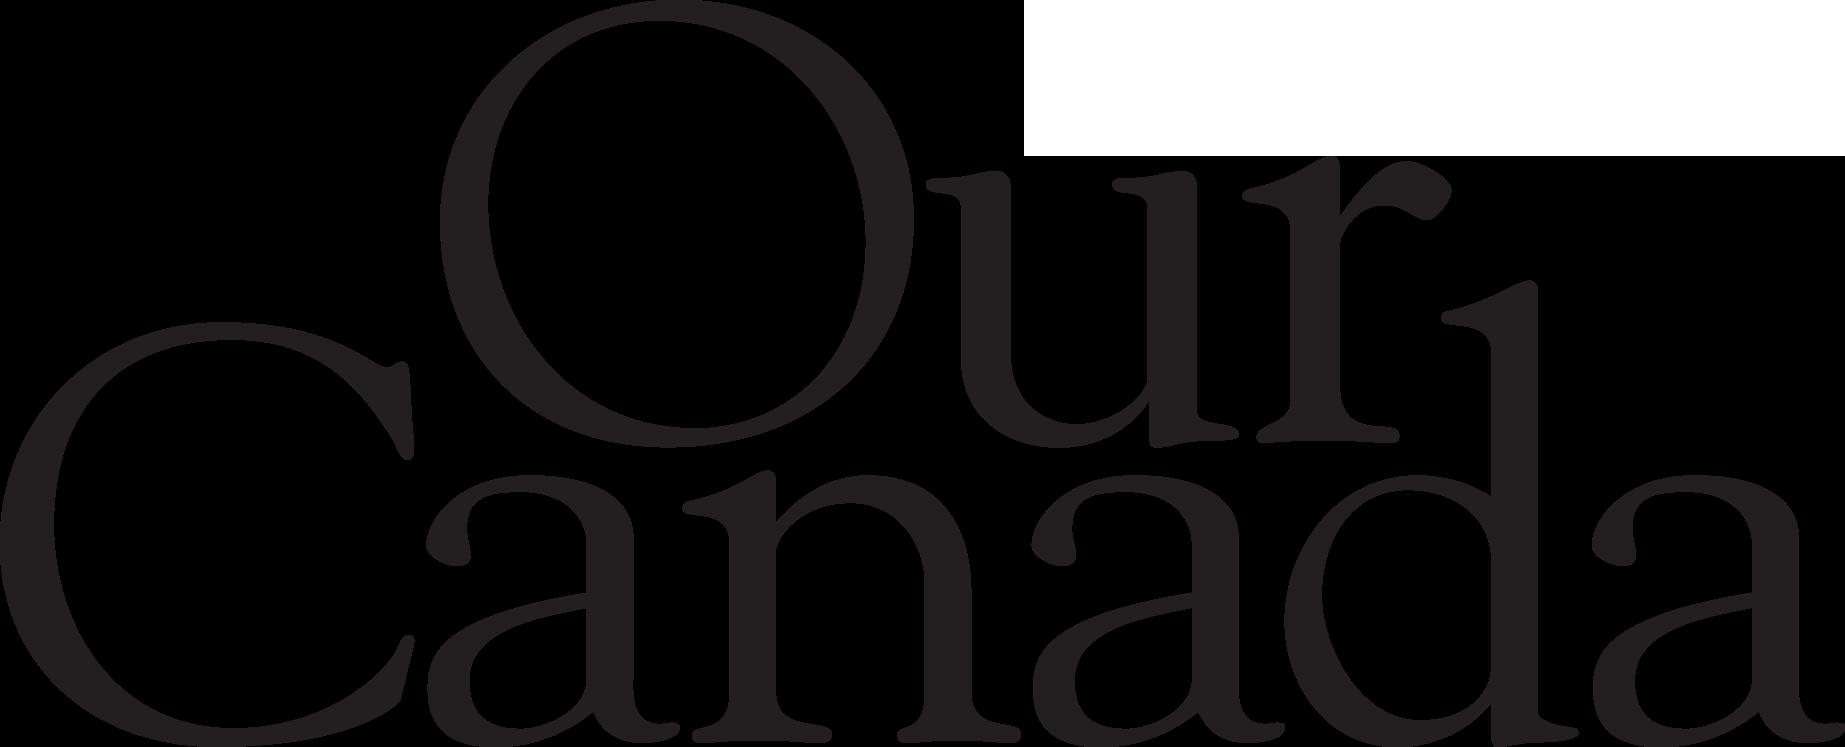 Our Canada logo